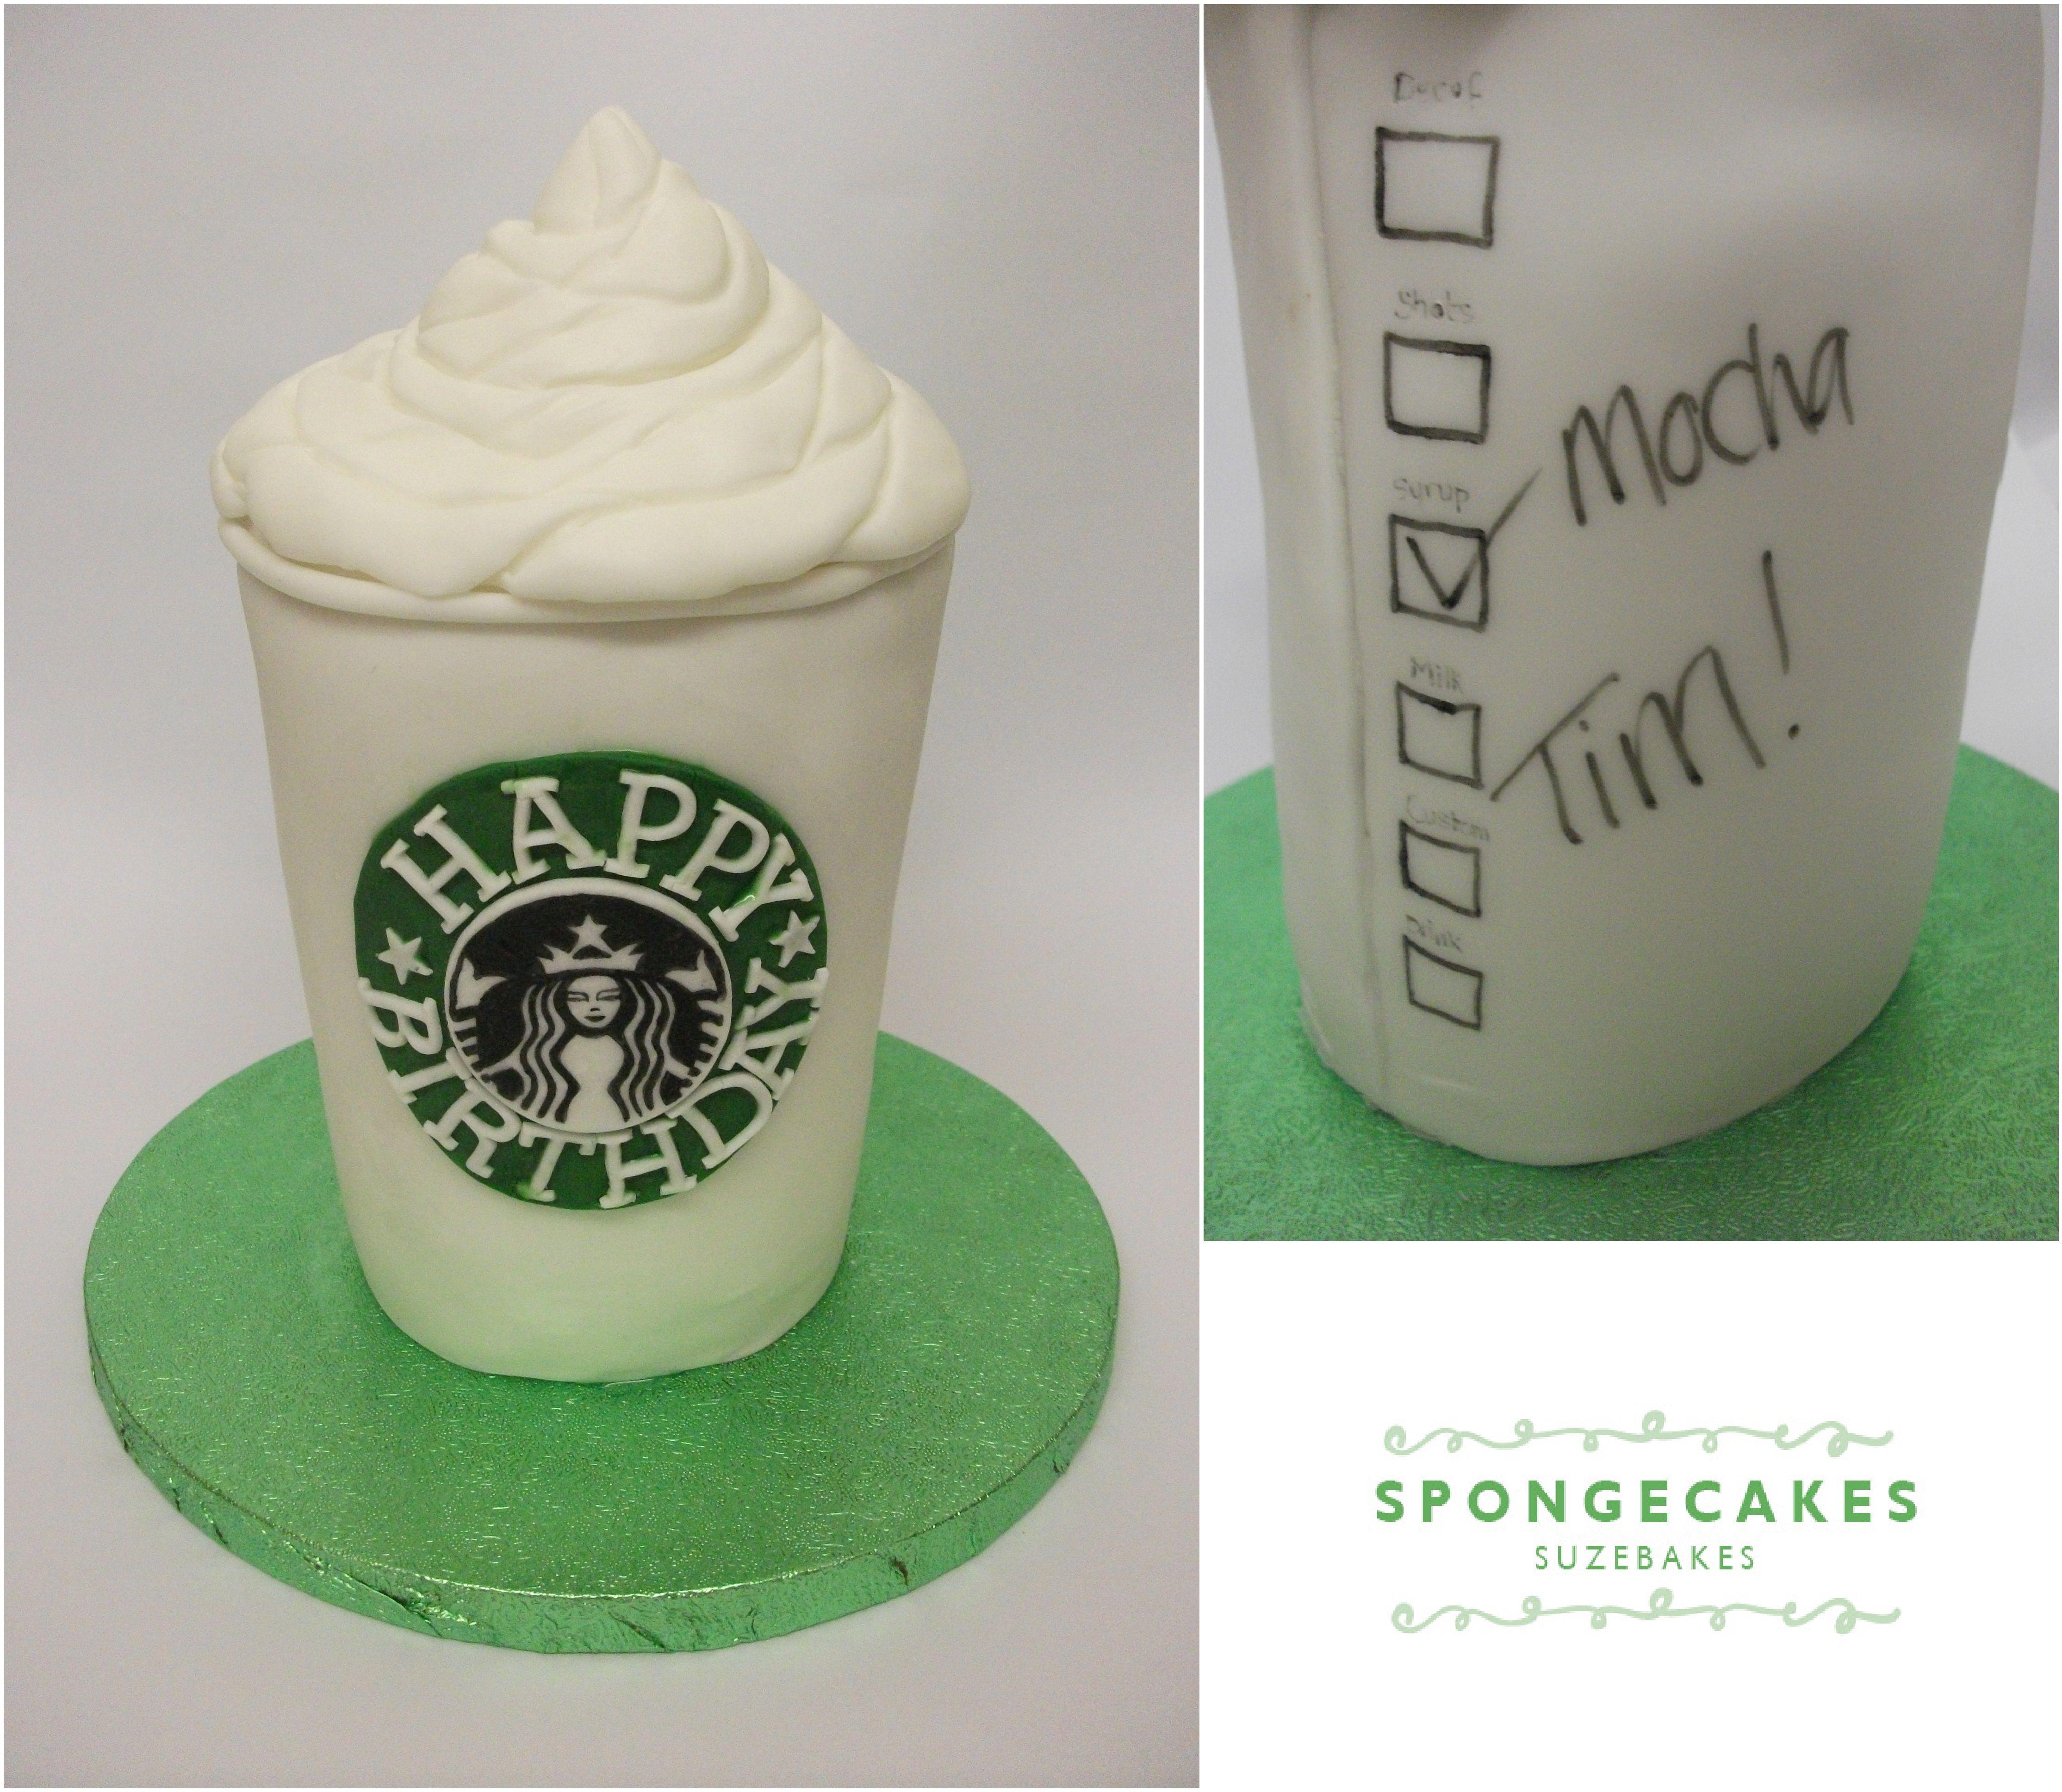 Starbucks Coffee Cup Cake | Starbucks cake, Fondant cake